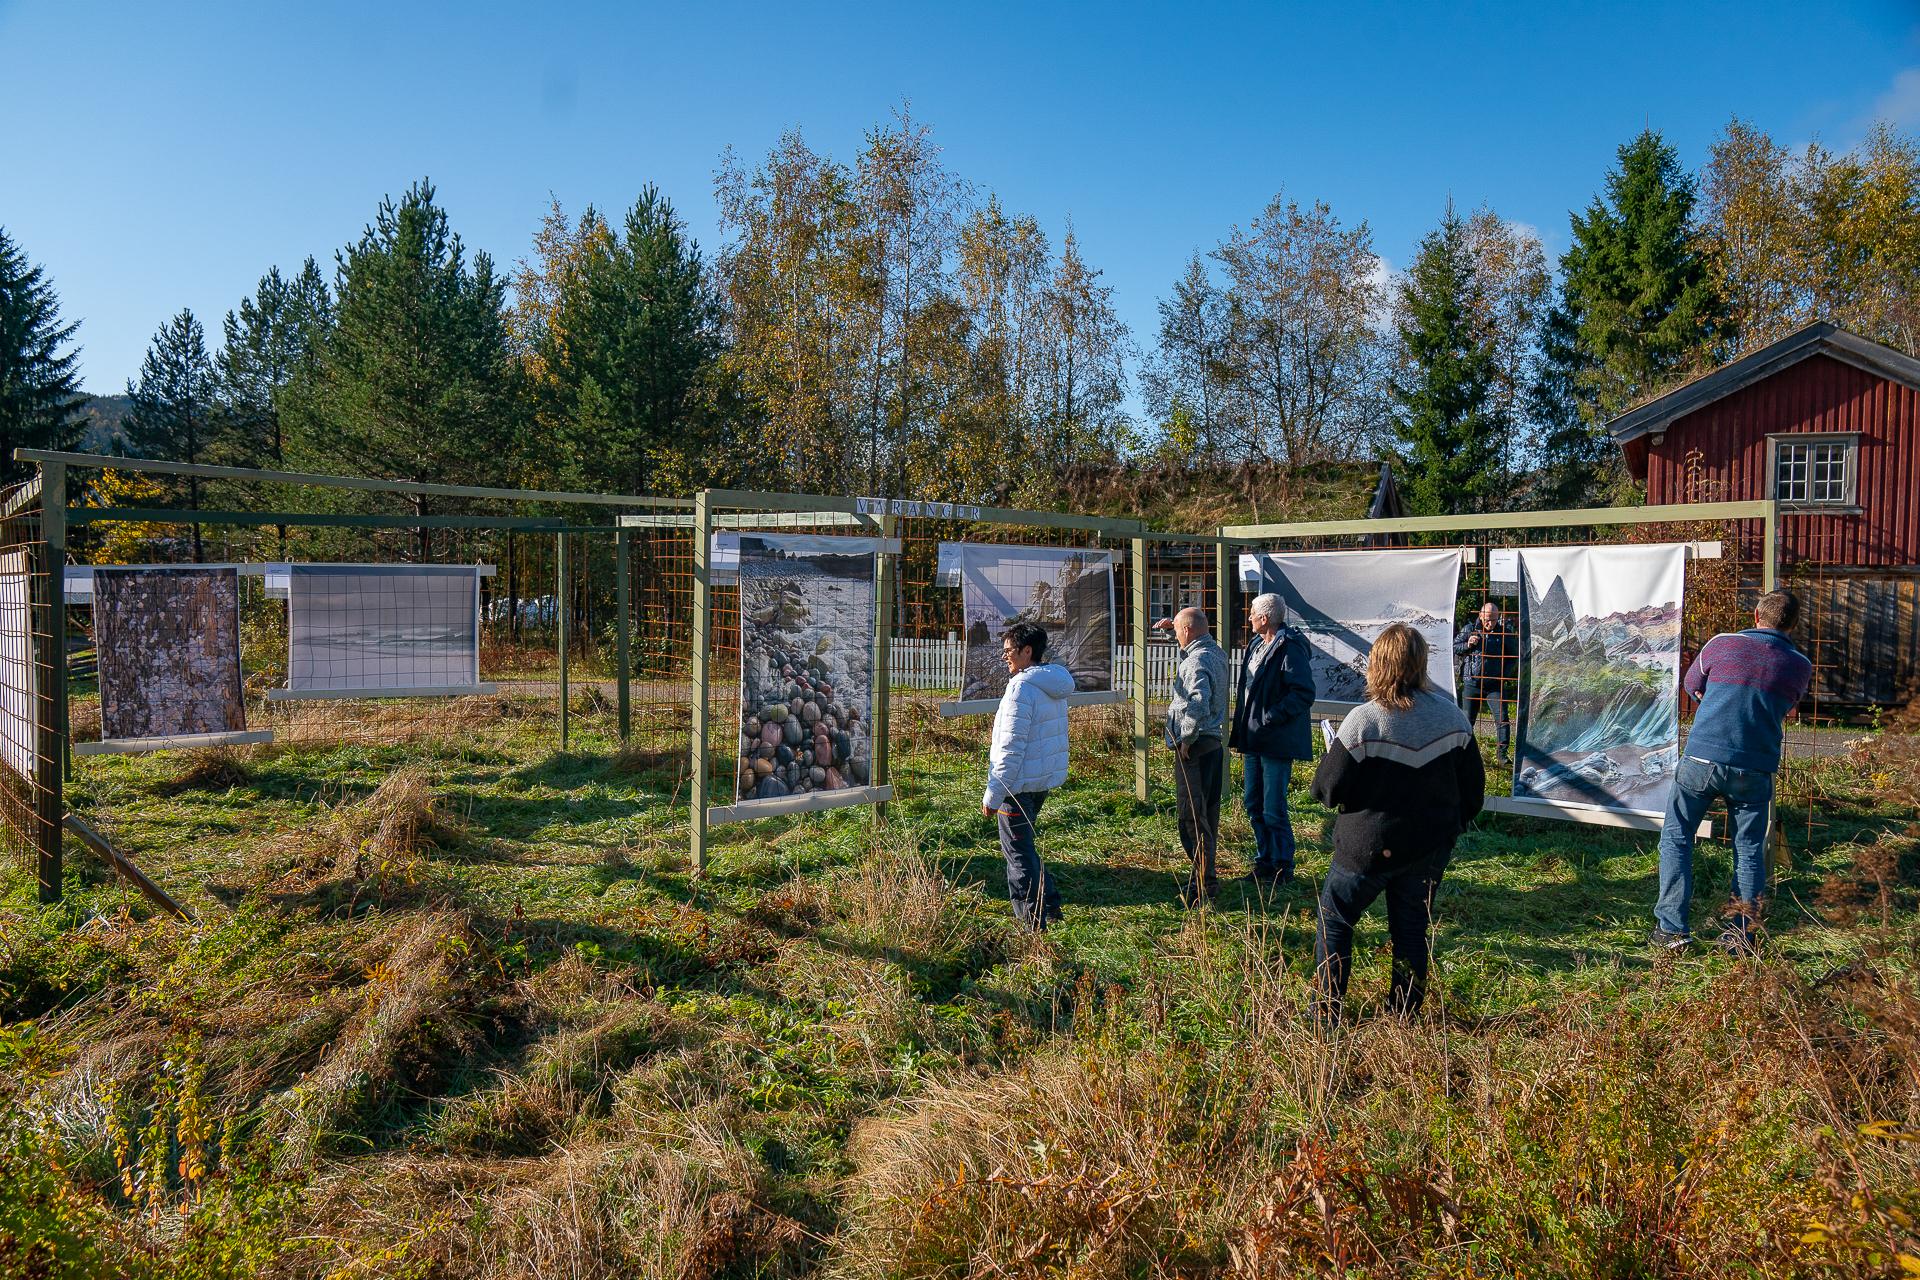 Outdoor exhibition in Trollheimen